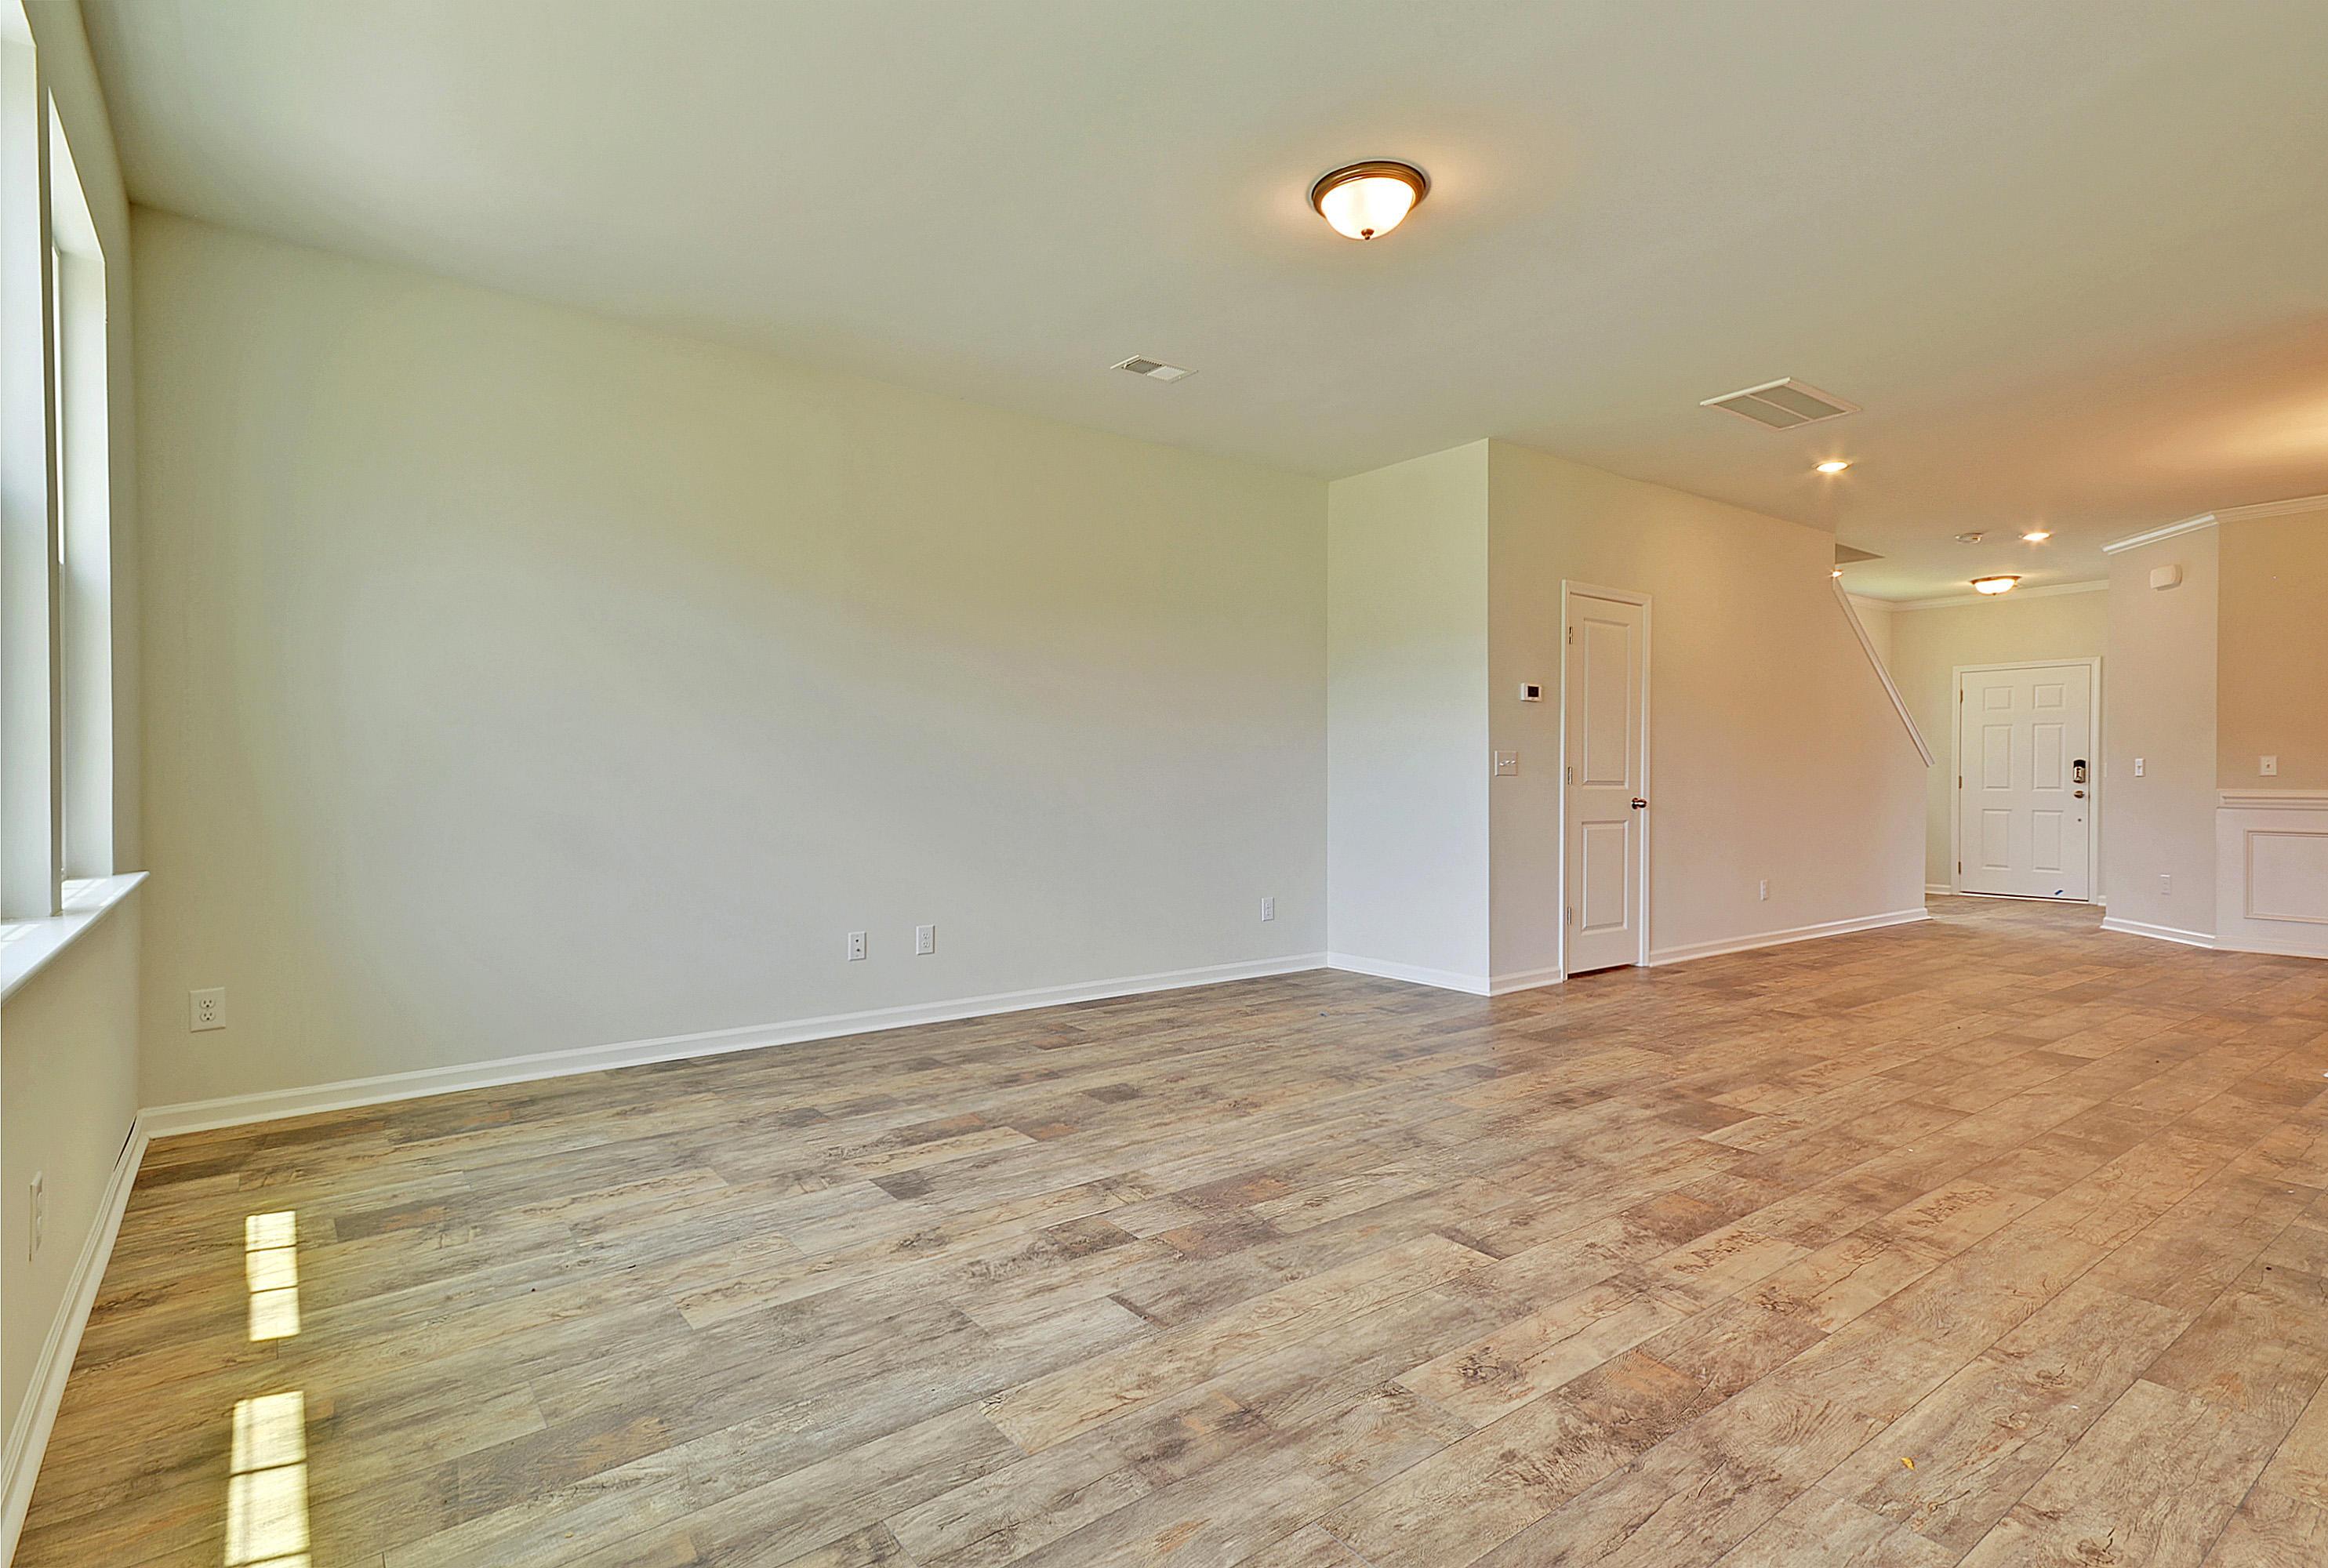 Coosaw Preserve Homes For Sale - 5162 Preserve Blvd, Ladson, SC - 19